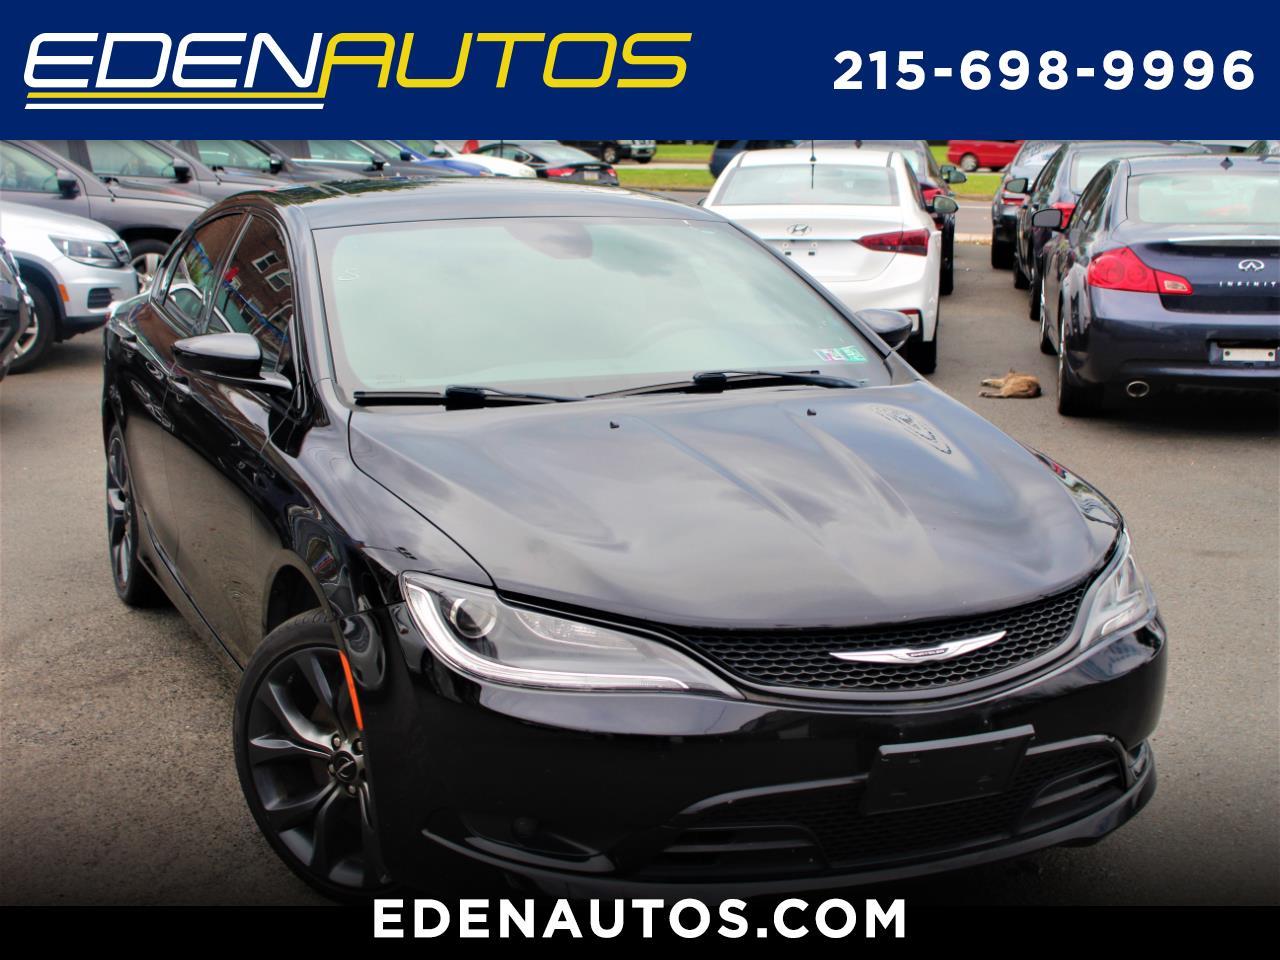 Chrysler 200 4dr Sdn S FWD 2015